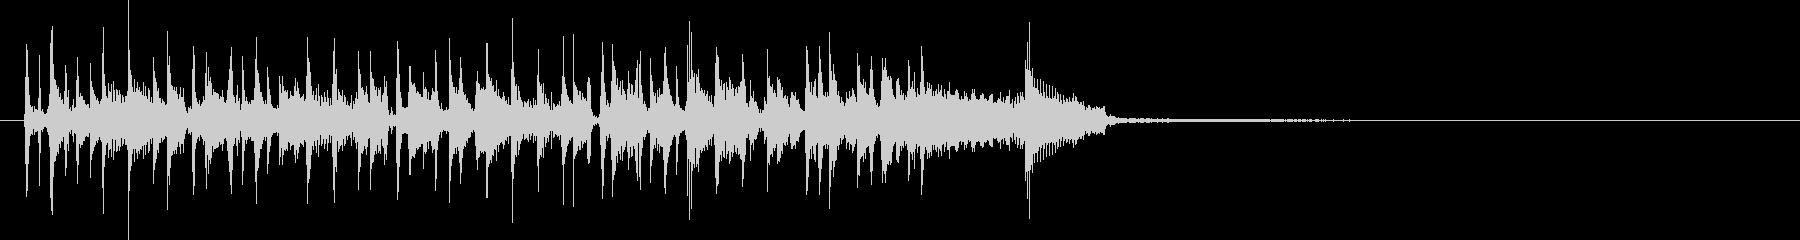 Bassスラップ風アイキャッチの未再生の波形